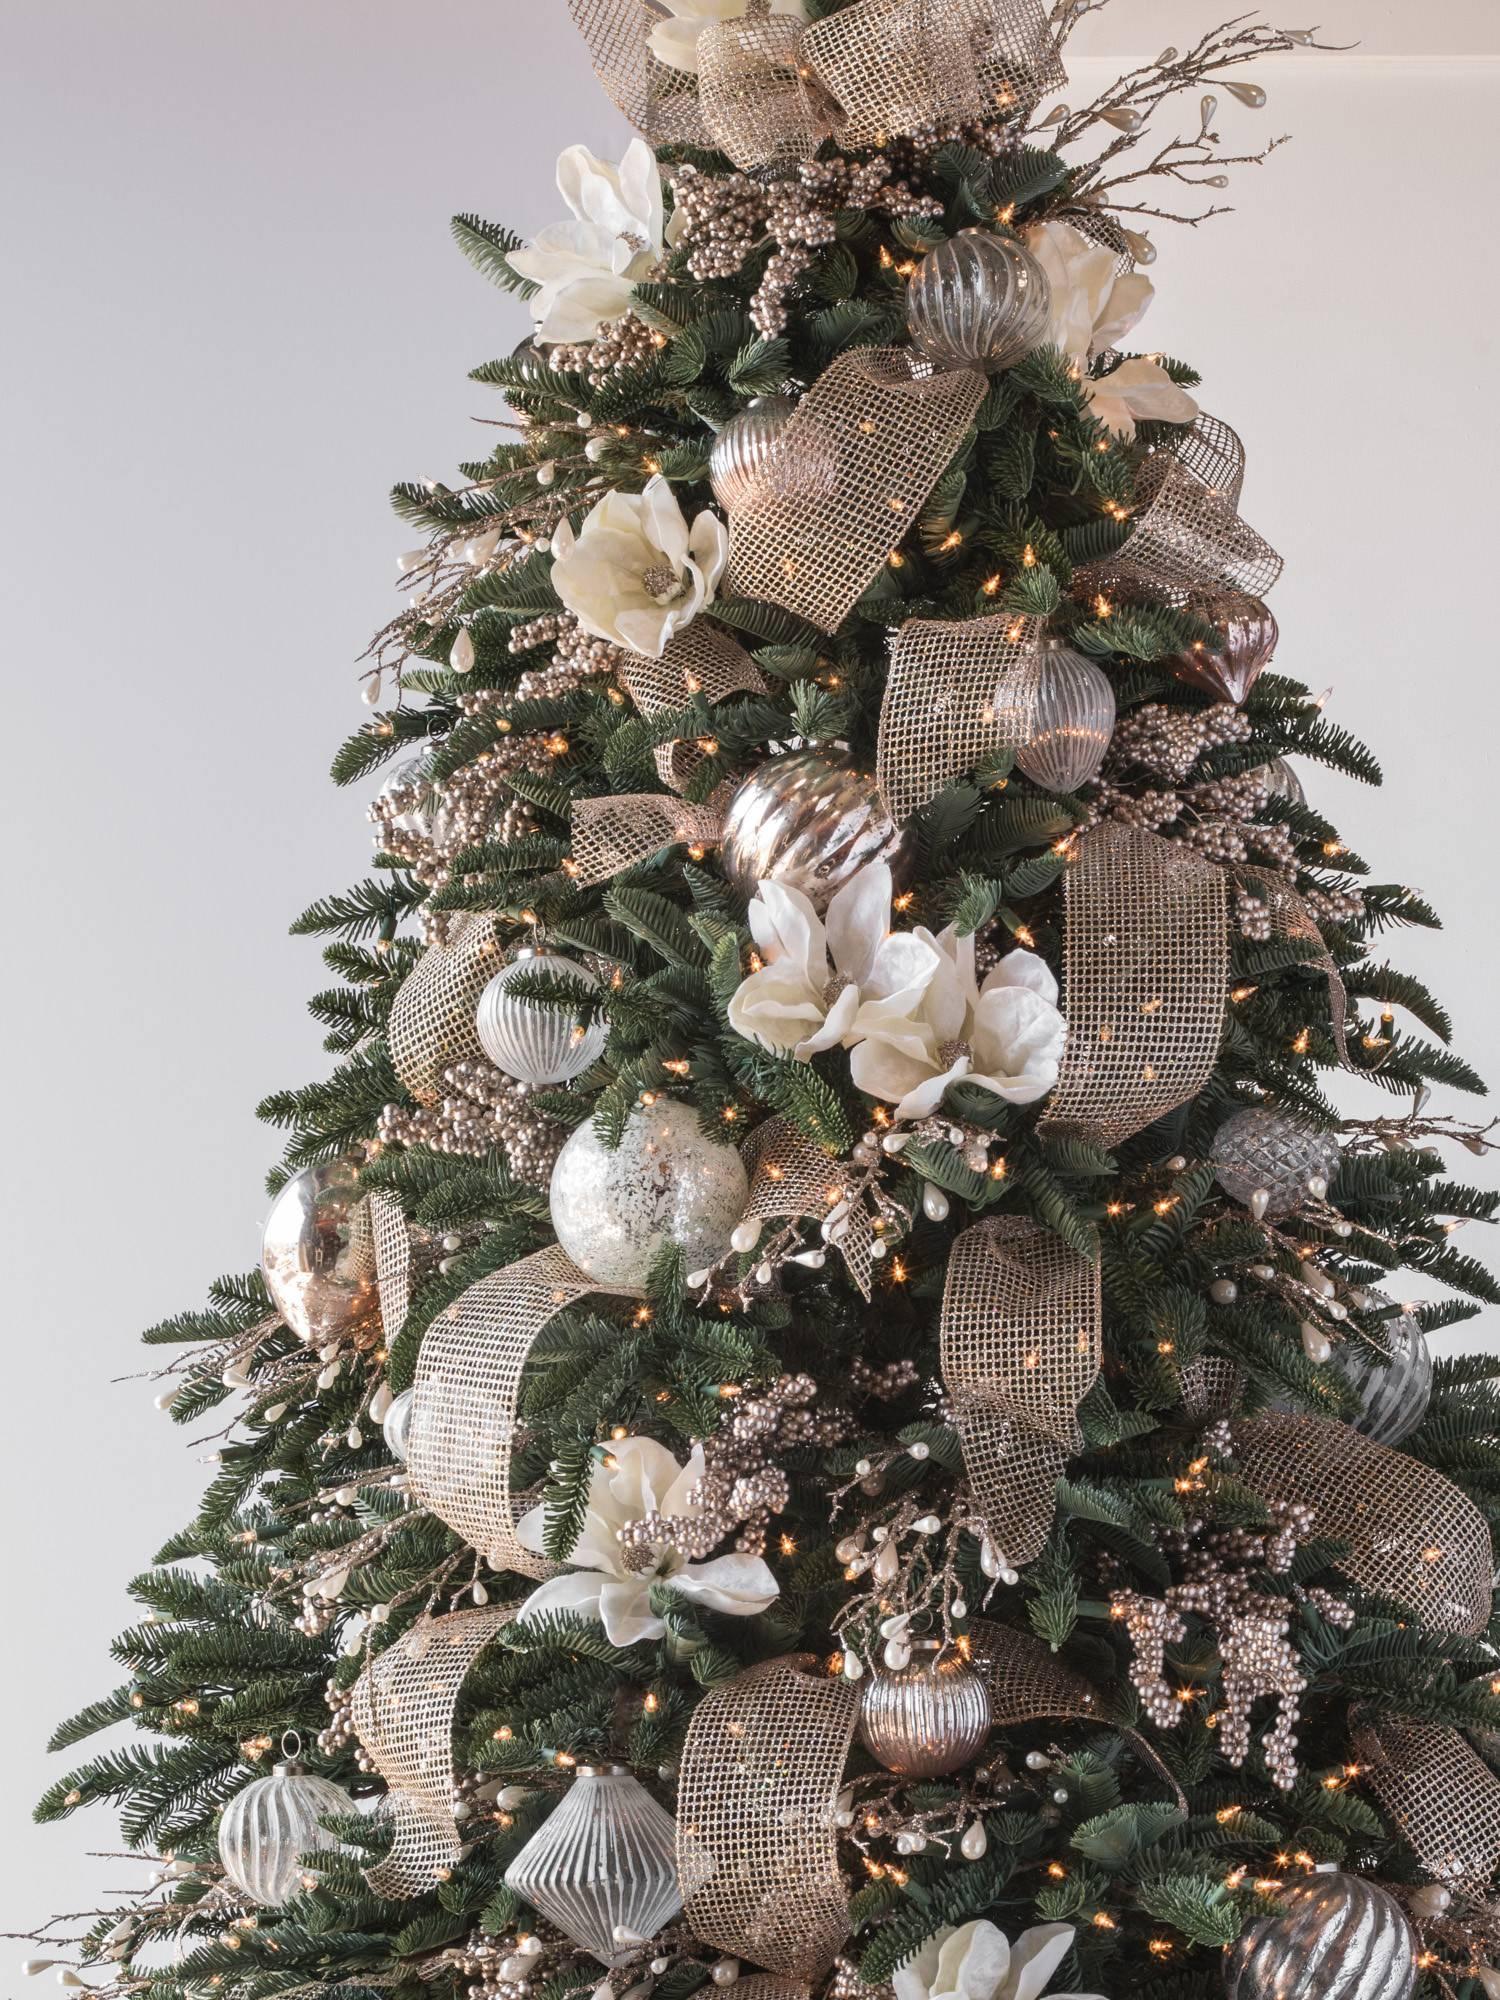 winter pearl glitter picks - The Christmas Pearl